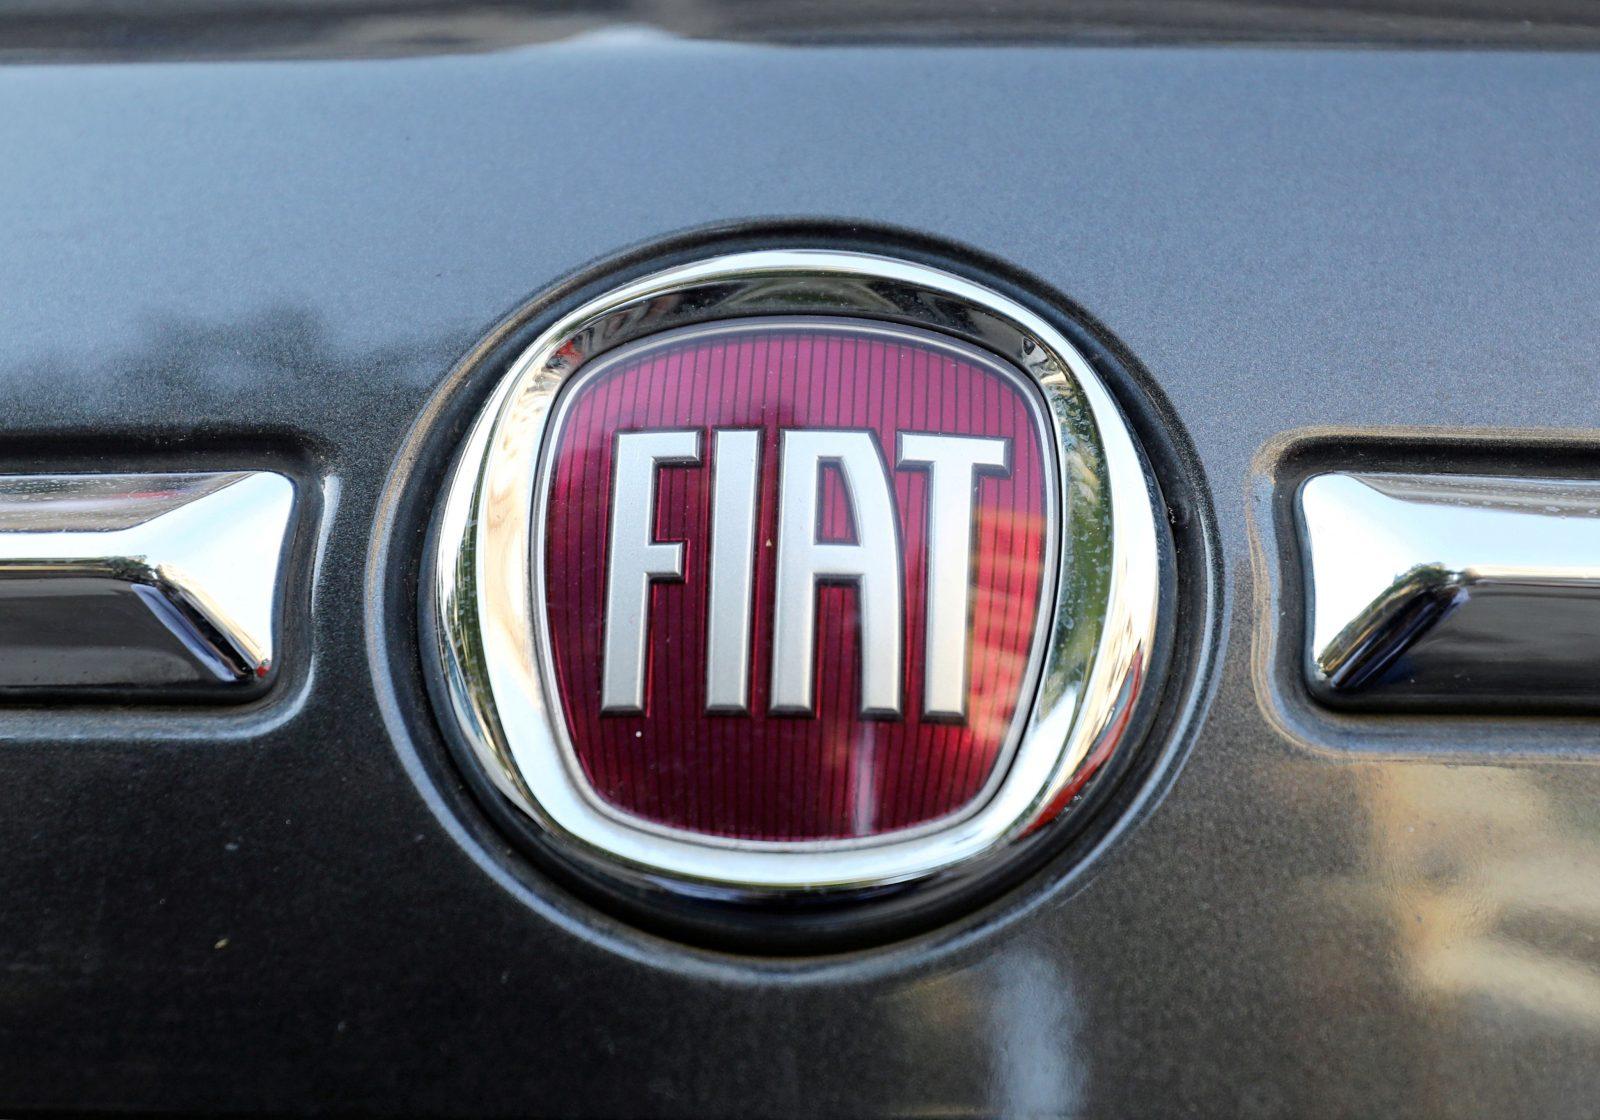 11 juillet 1899 – Fondation de Fiat